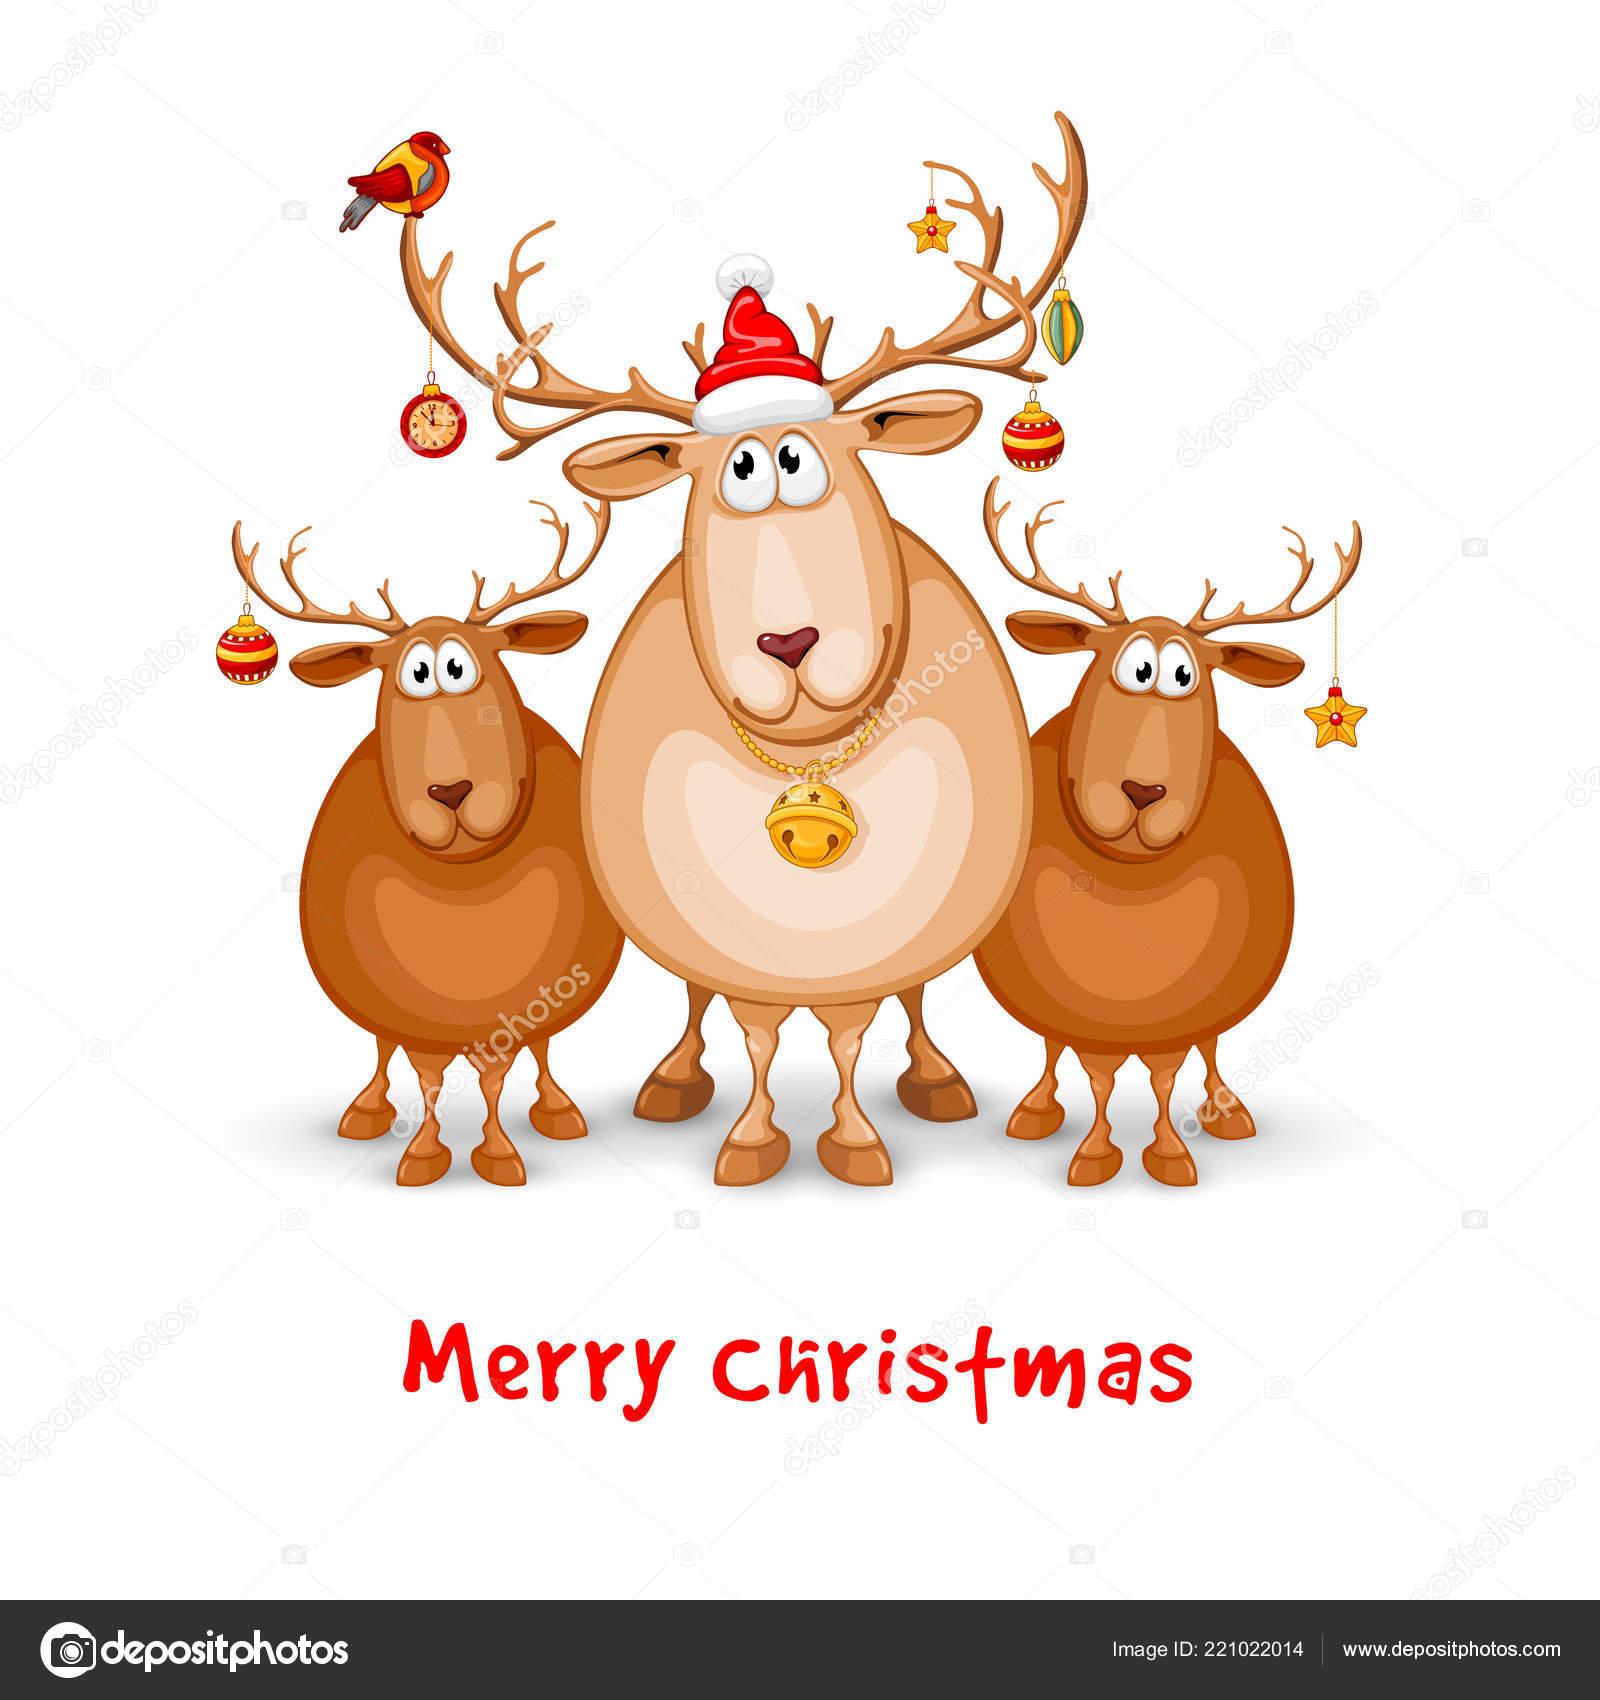 merry christmas happy new year greeting design cartoon funny reindeers stock vector